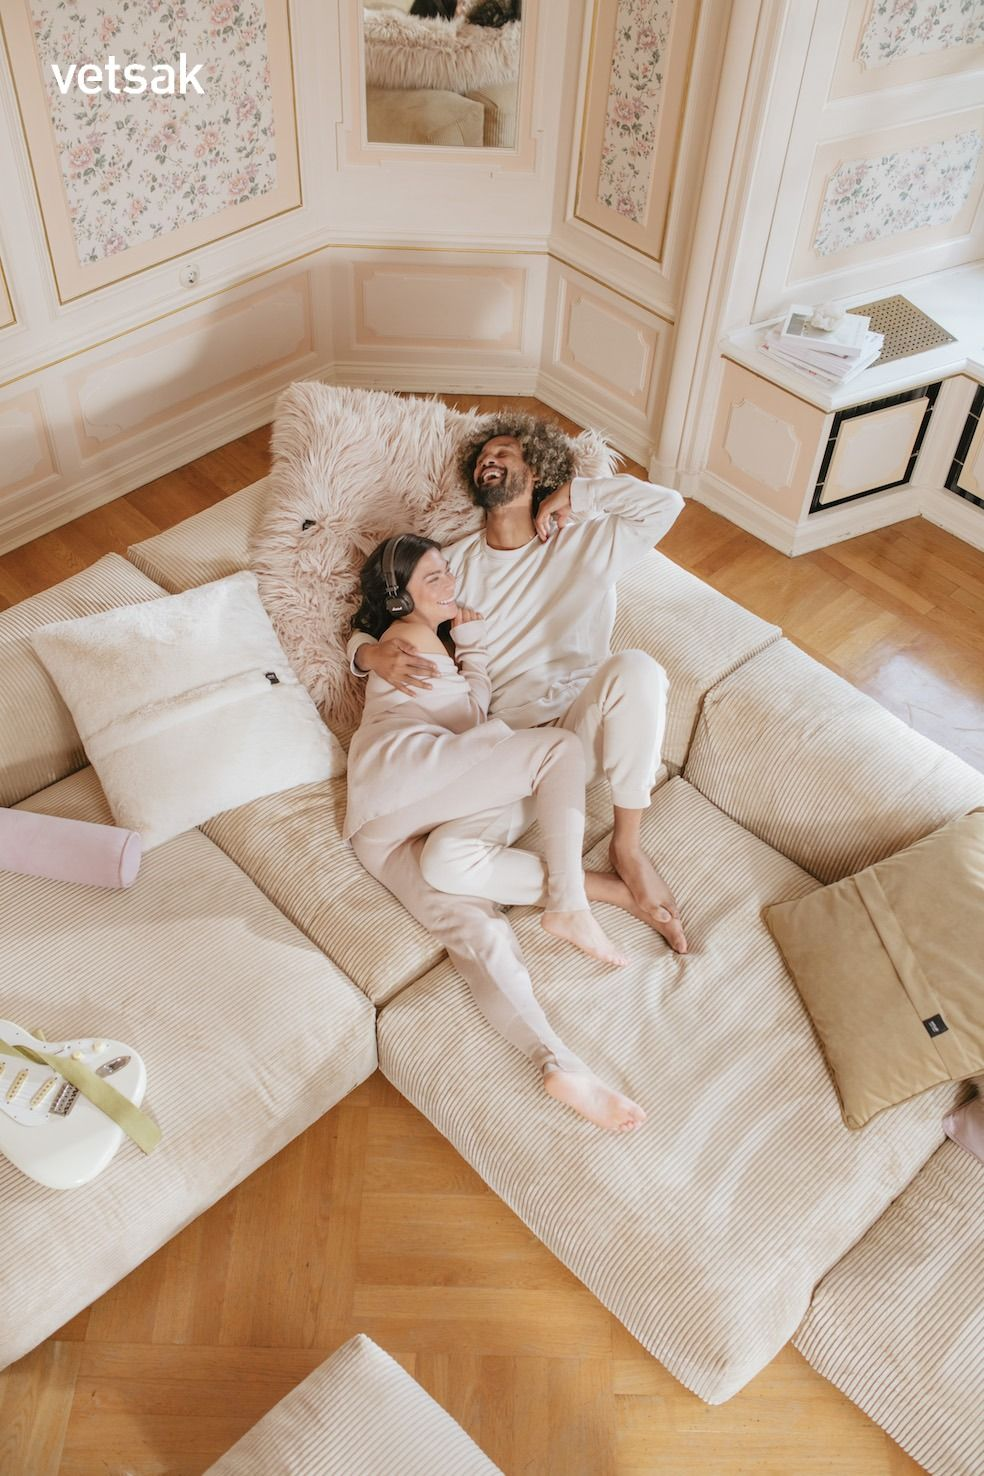 vetsak® Sofa 2 Large 2 Medium 3 Side Cord Velours sand